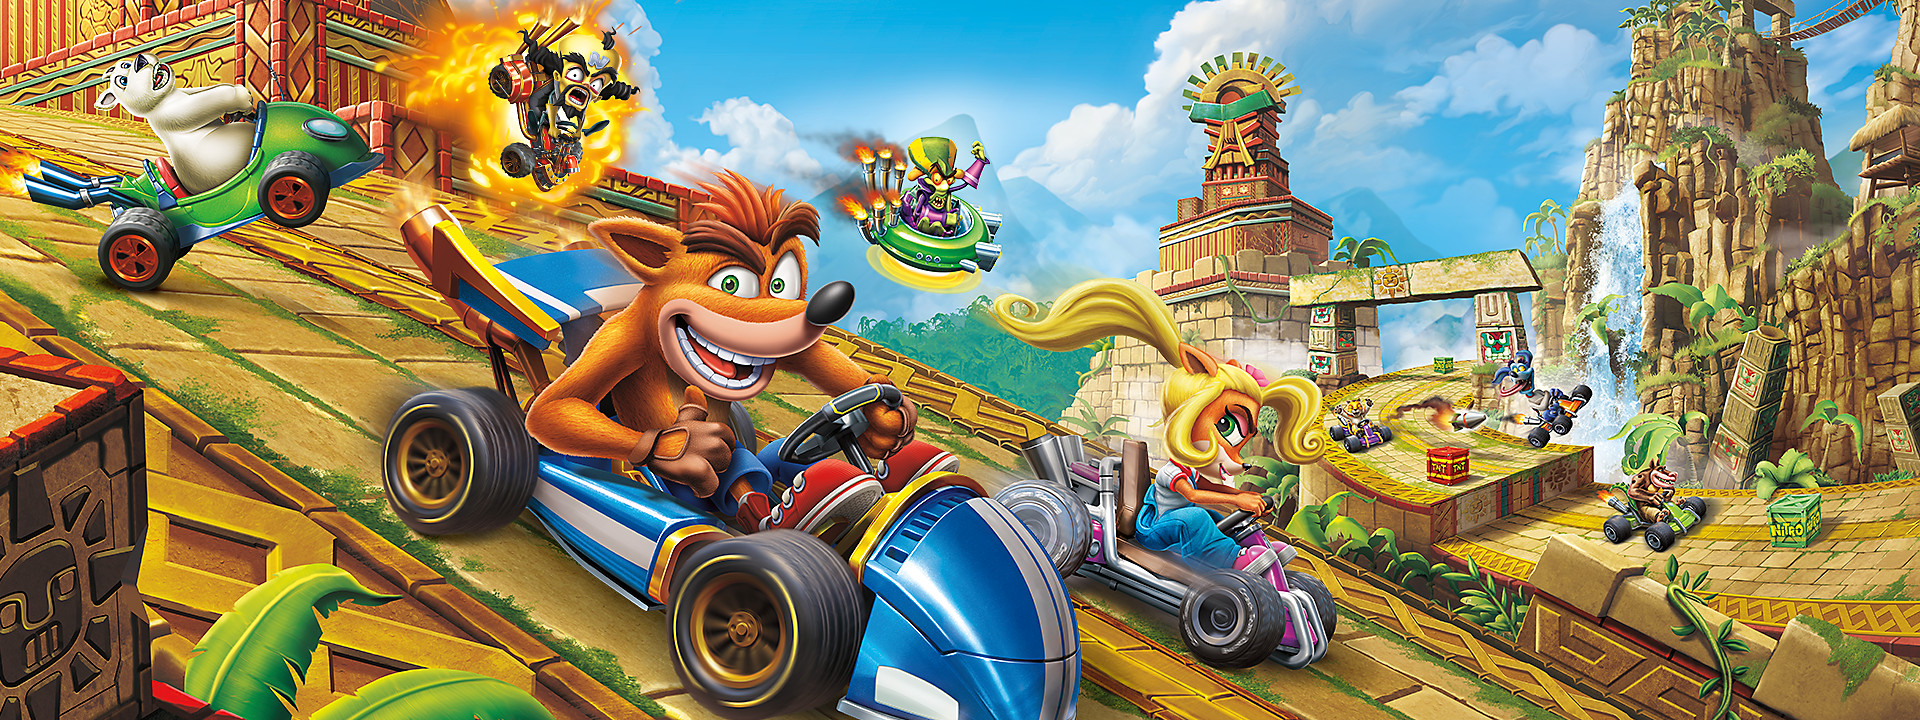 crash team racing nitro fueled cover art featured image.jpg